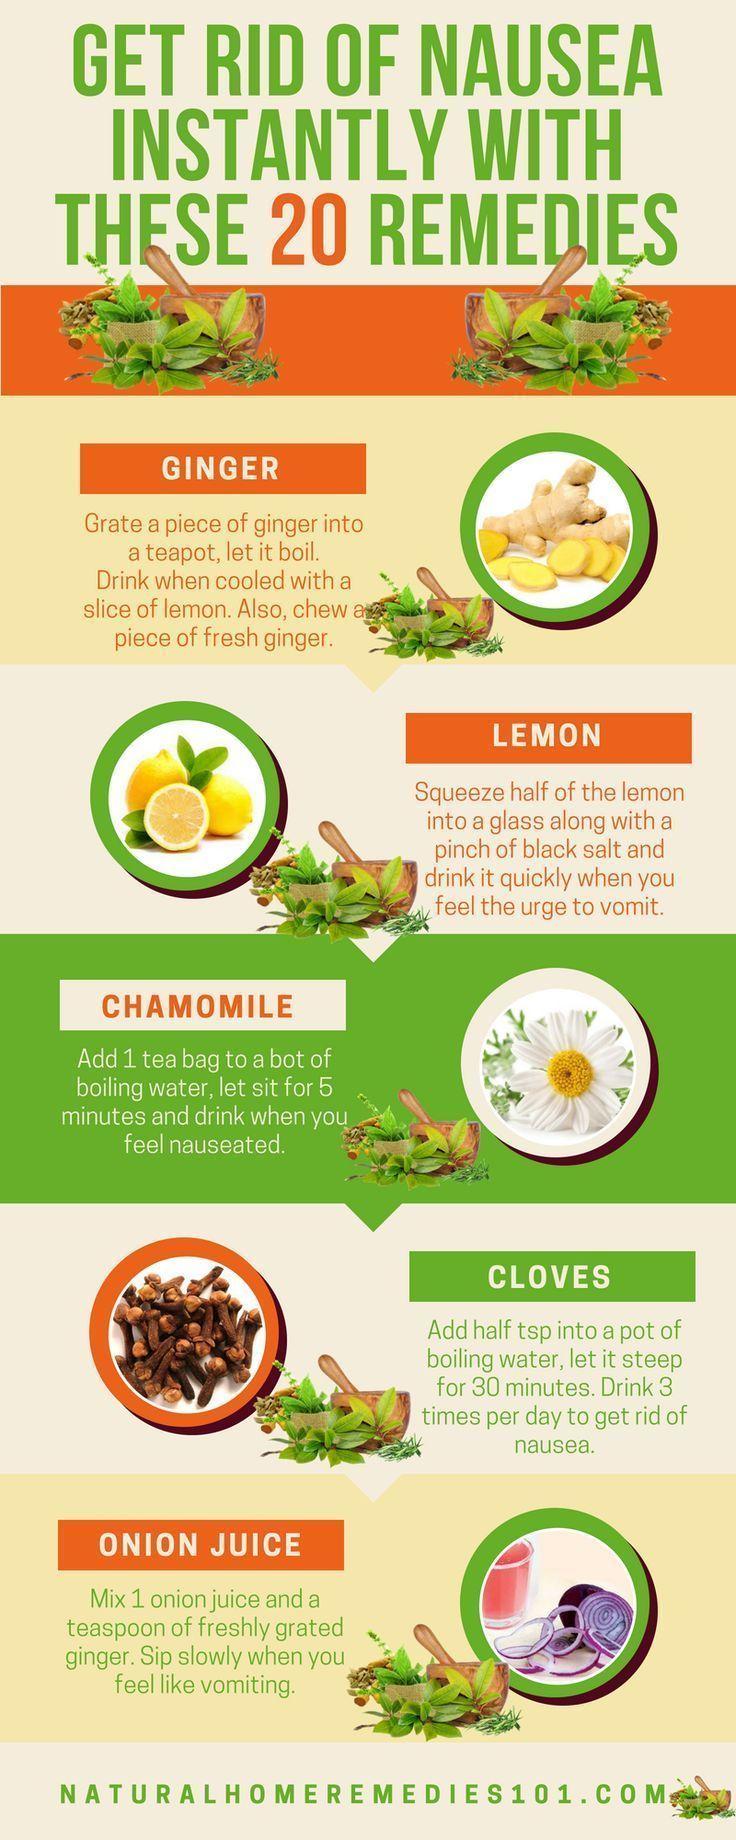 20 Home Remedies For Nausea Get Rid Of Nausea Fast With These Natural Home Remedies Home Remedies For Nausea Get Rid Of Nausea Natural Headache Remedies